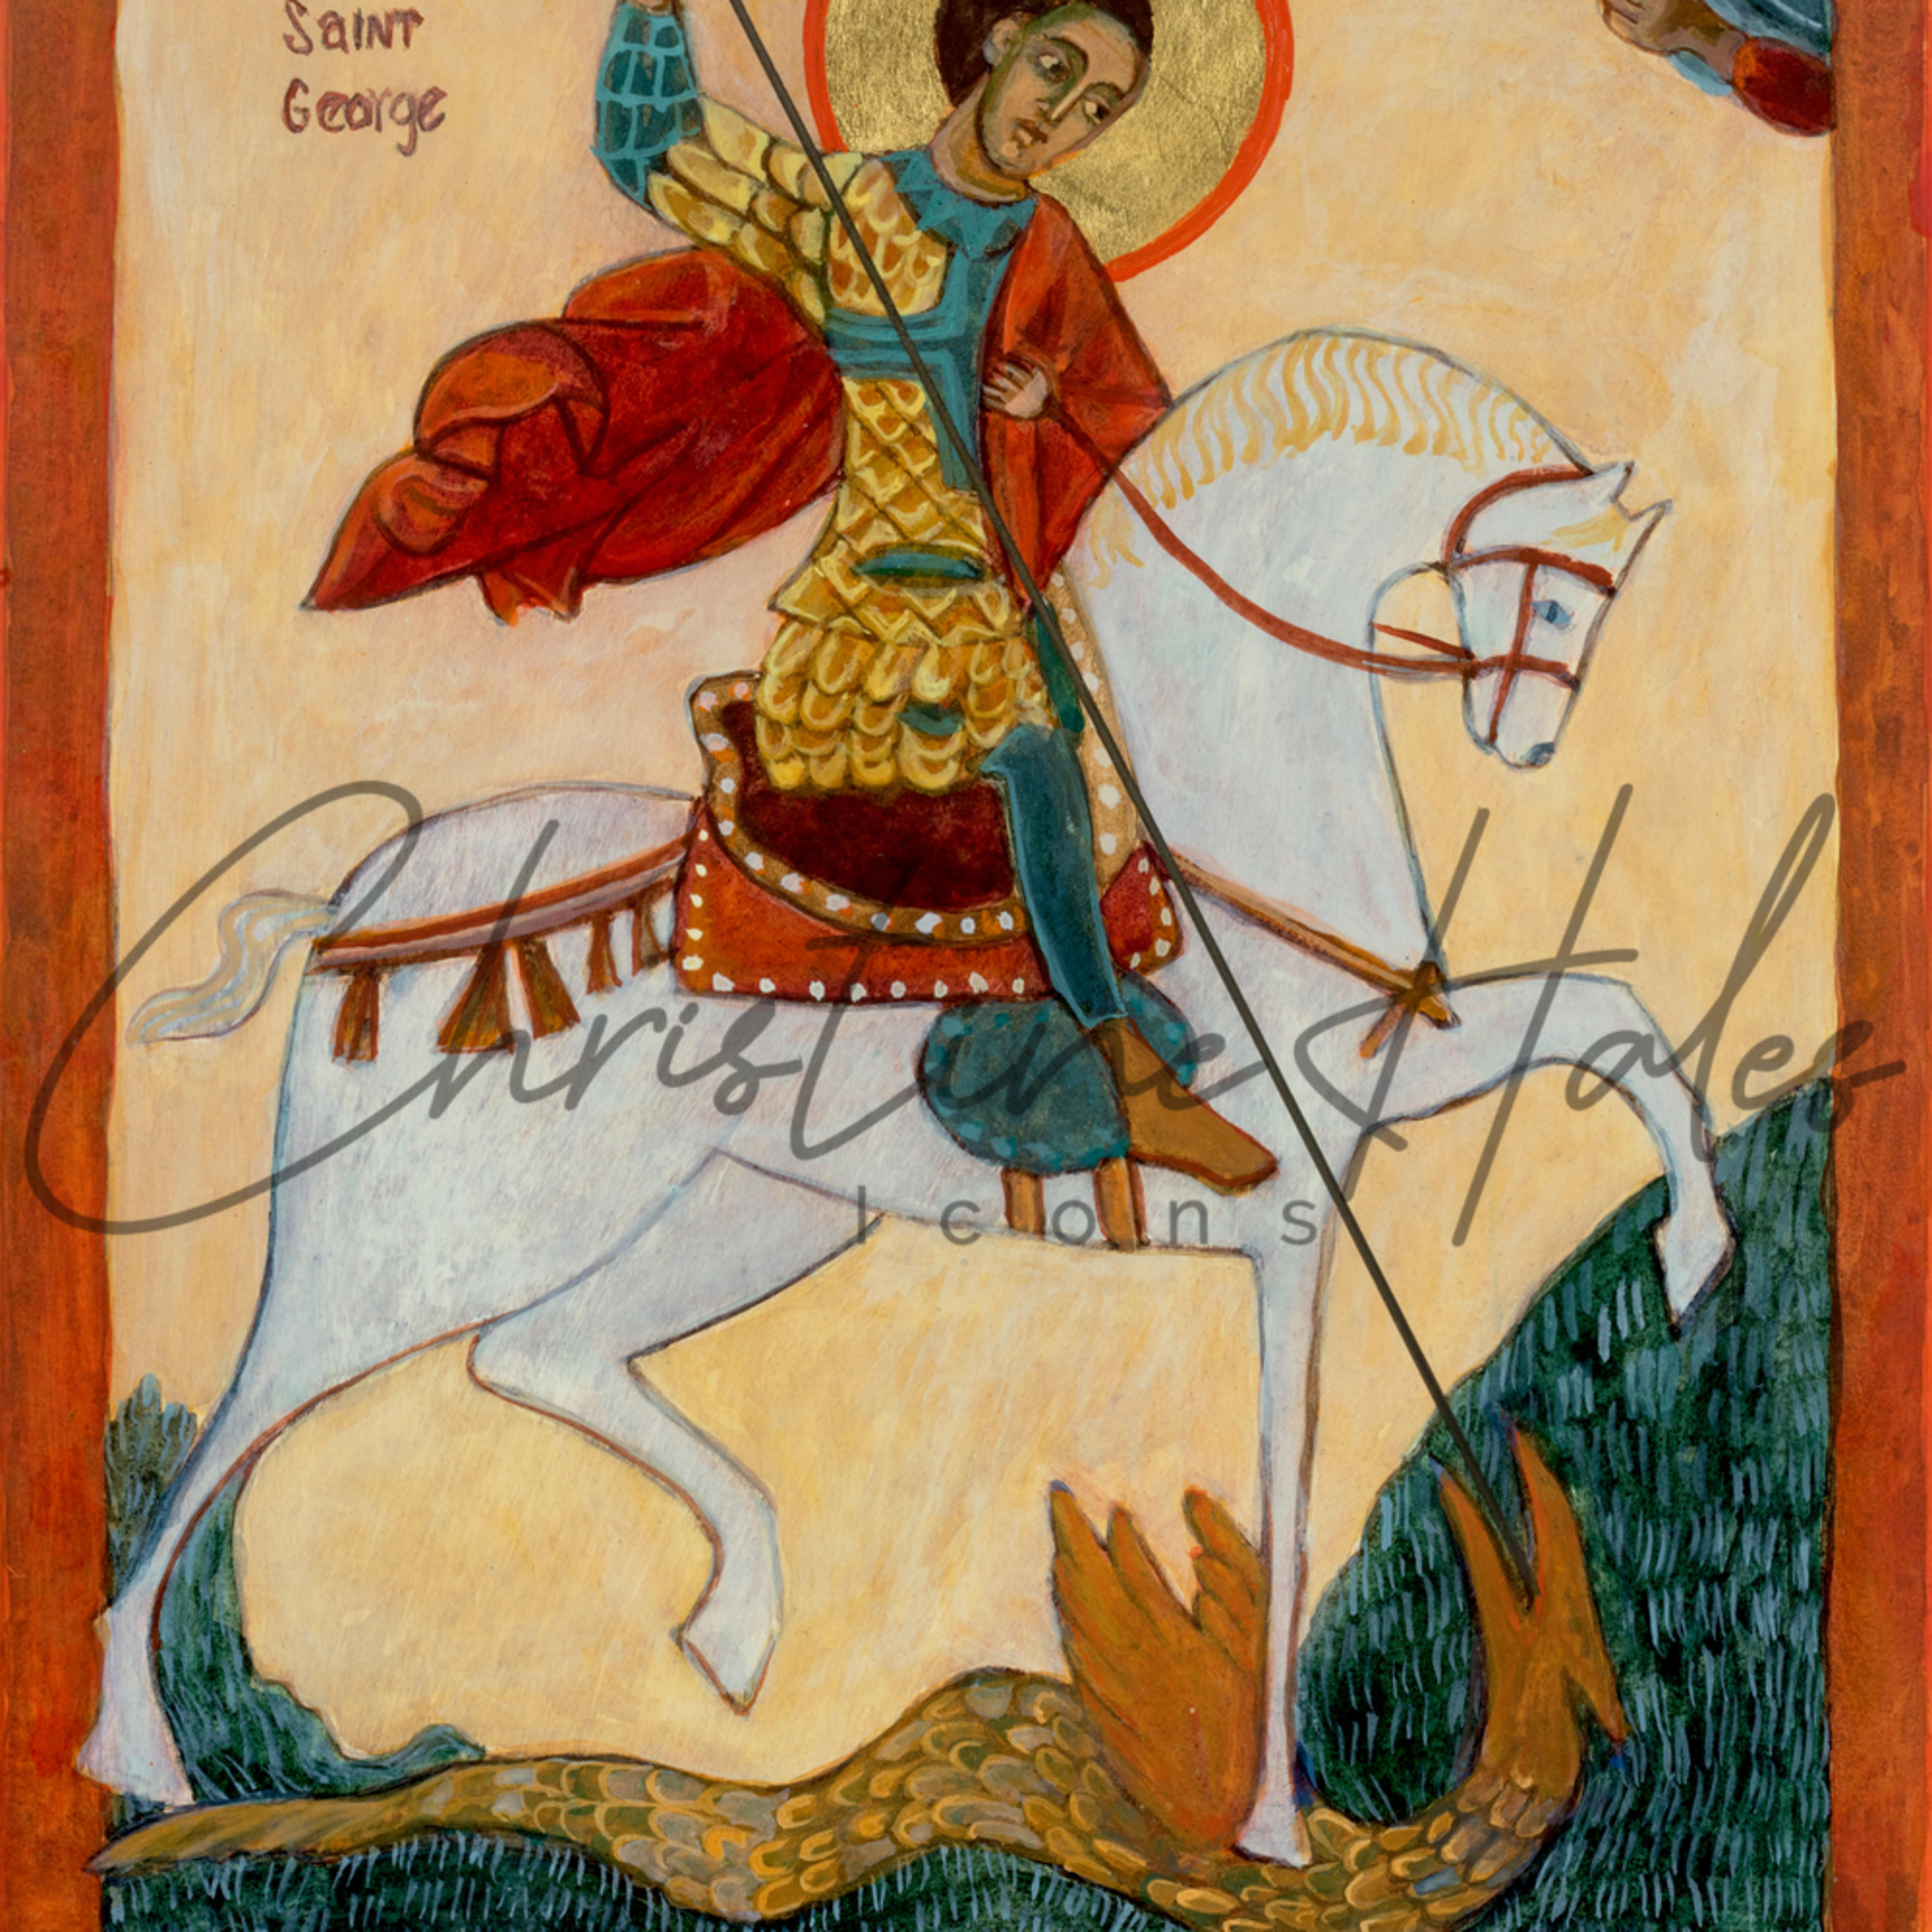 Saint george axfutu